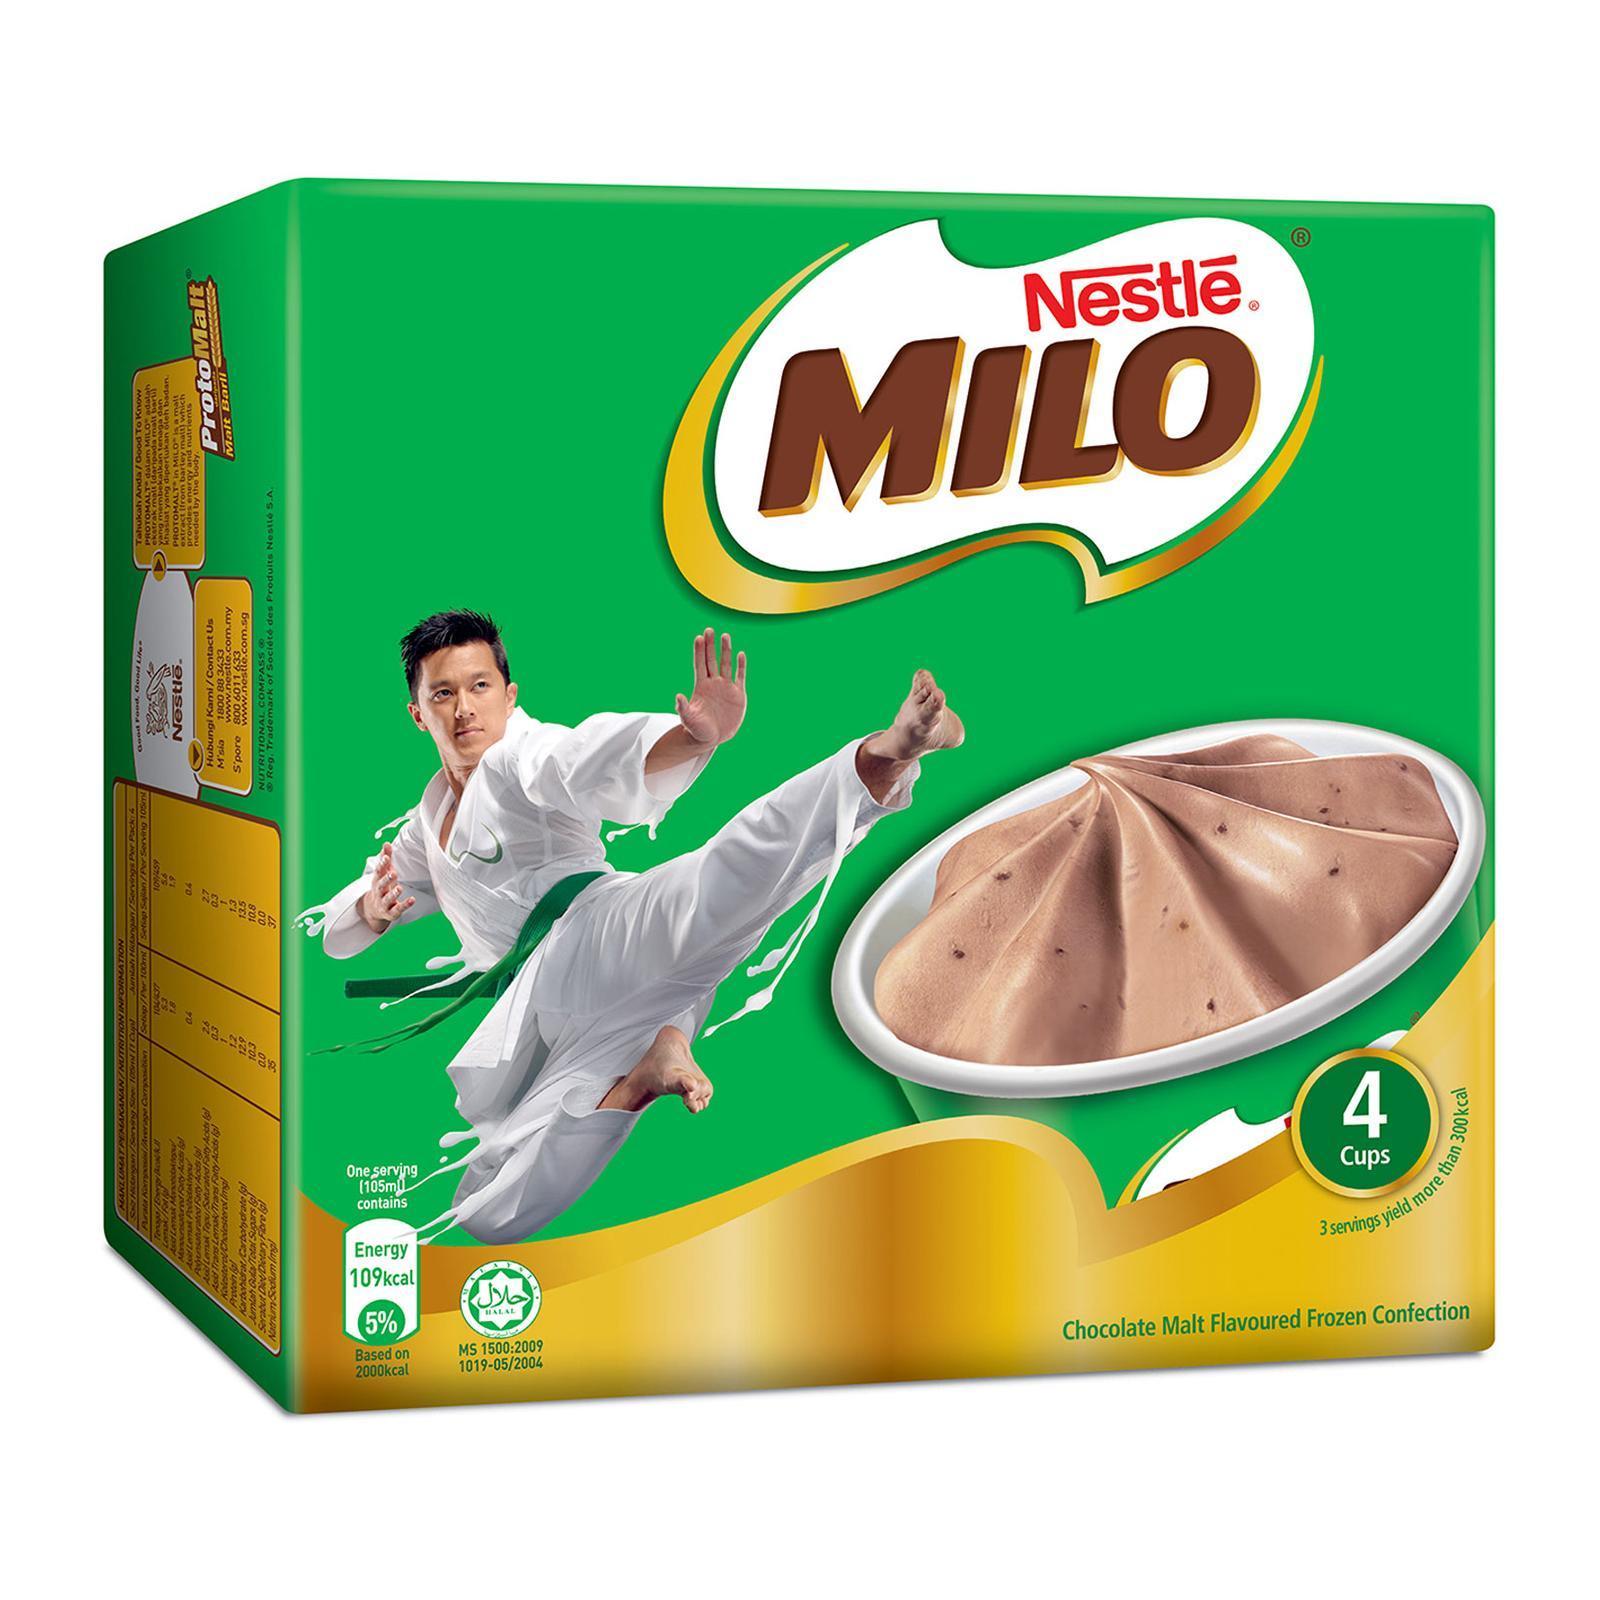 NESTLE Milo Cup Multipack Ice Cream 4sX105ml